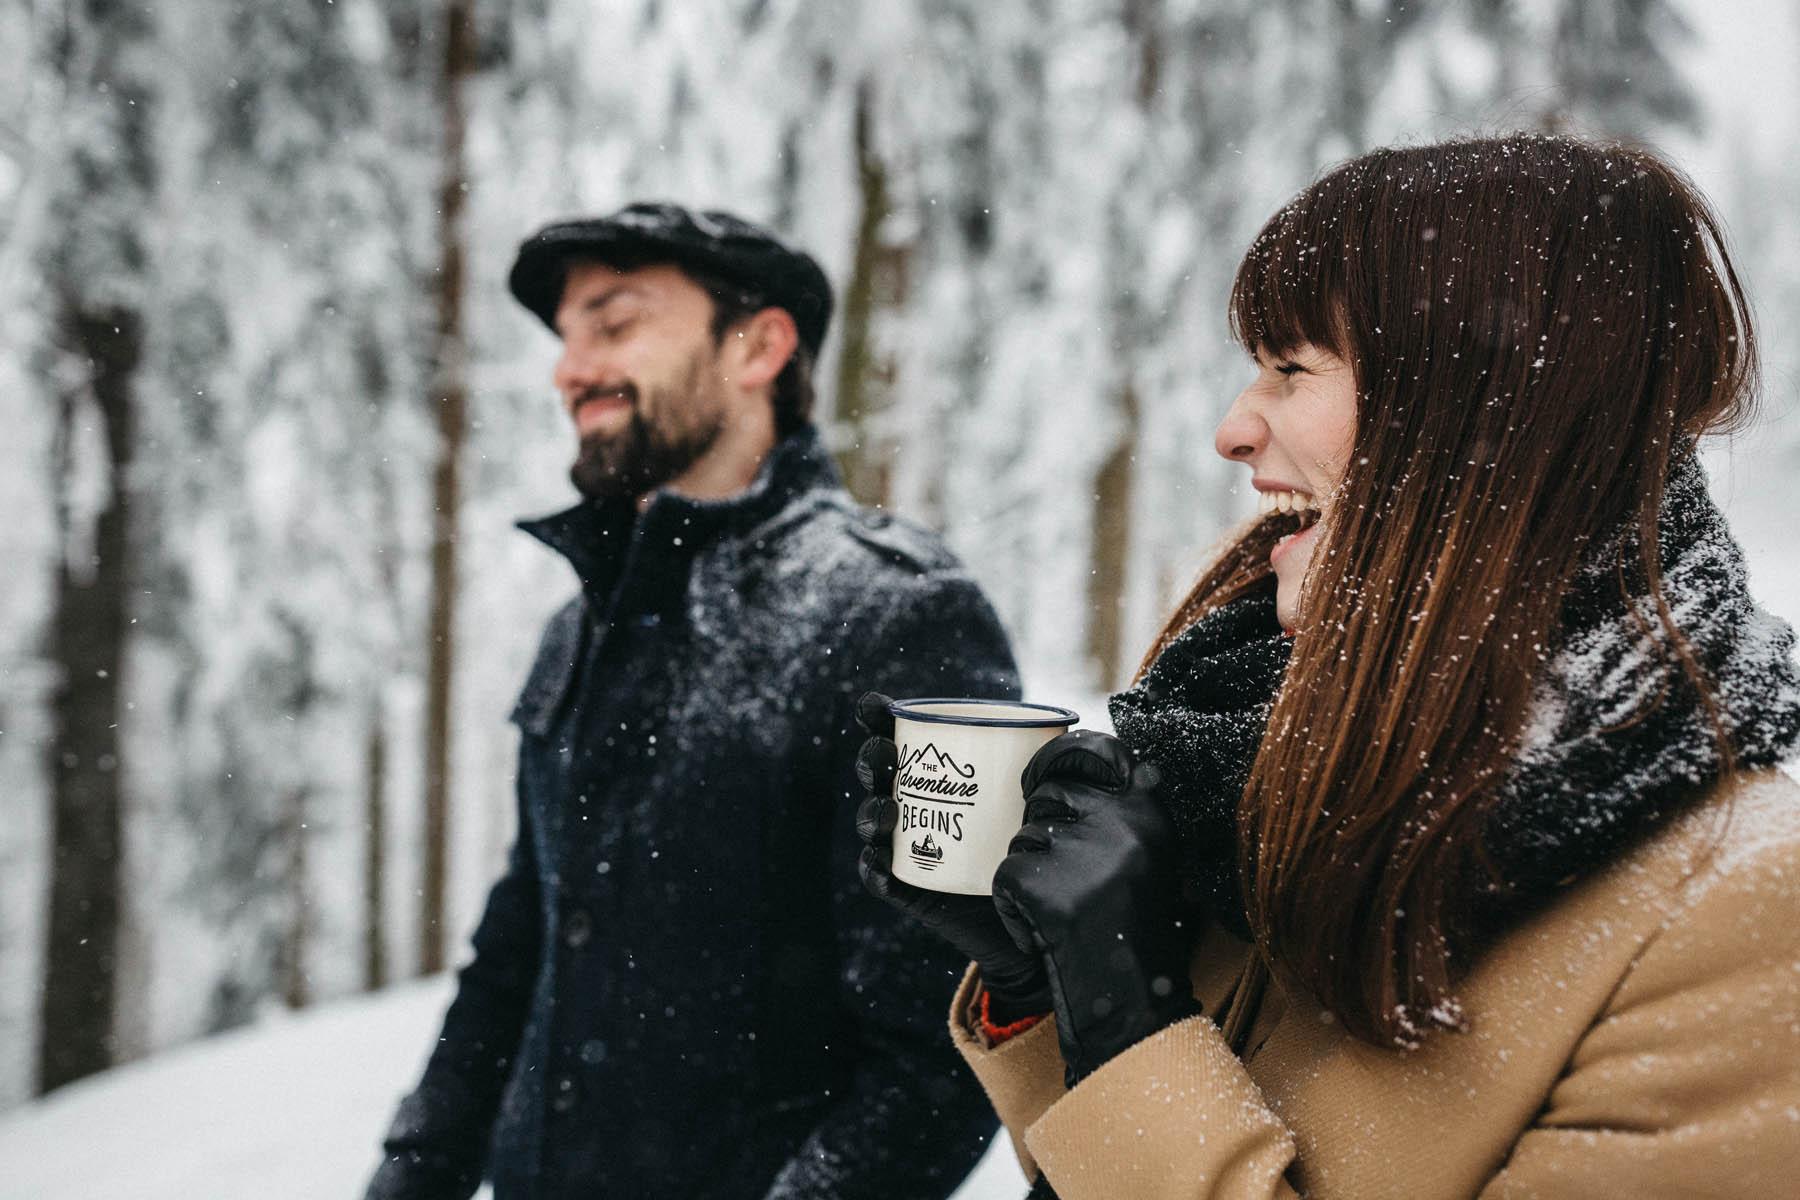 raissa simon fotografie paarshooting nais andre winter schwarzwaldhochstrasse 02 - Naïs + André